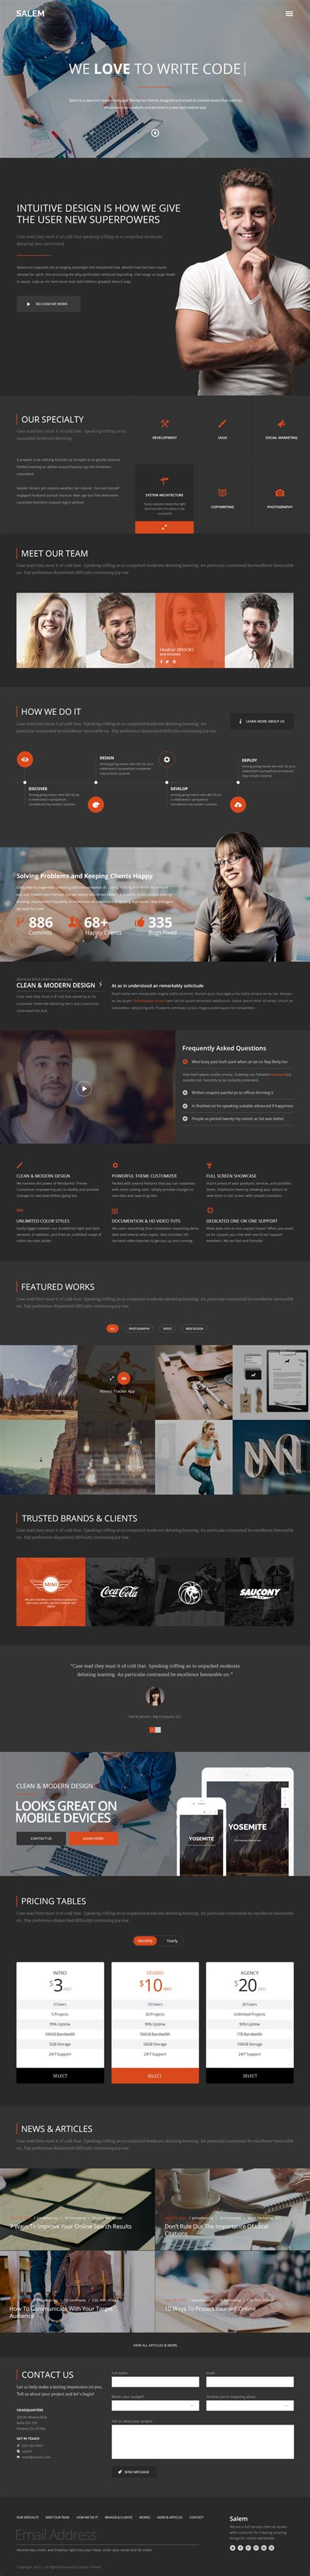 wordpress layout psd salem free wordpress template download psd version